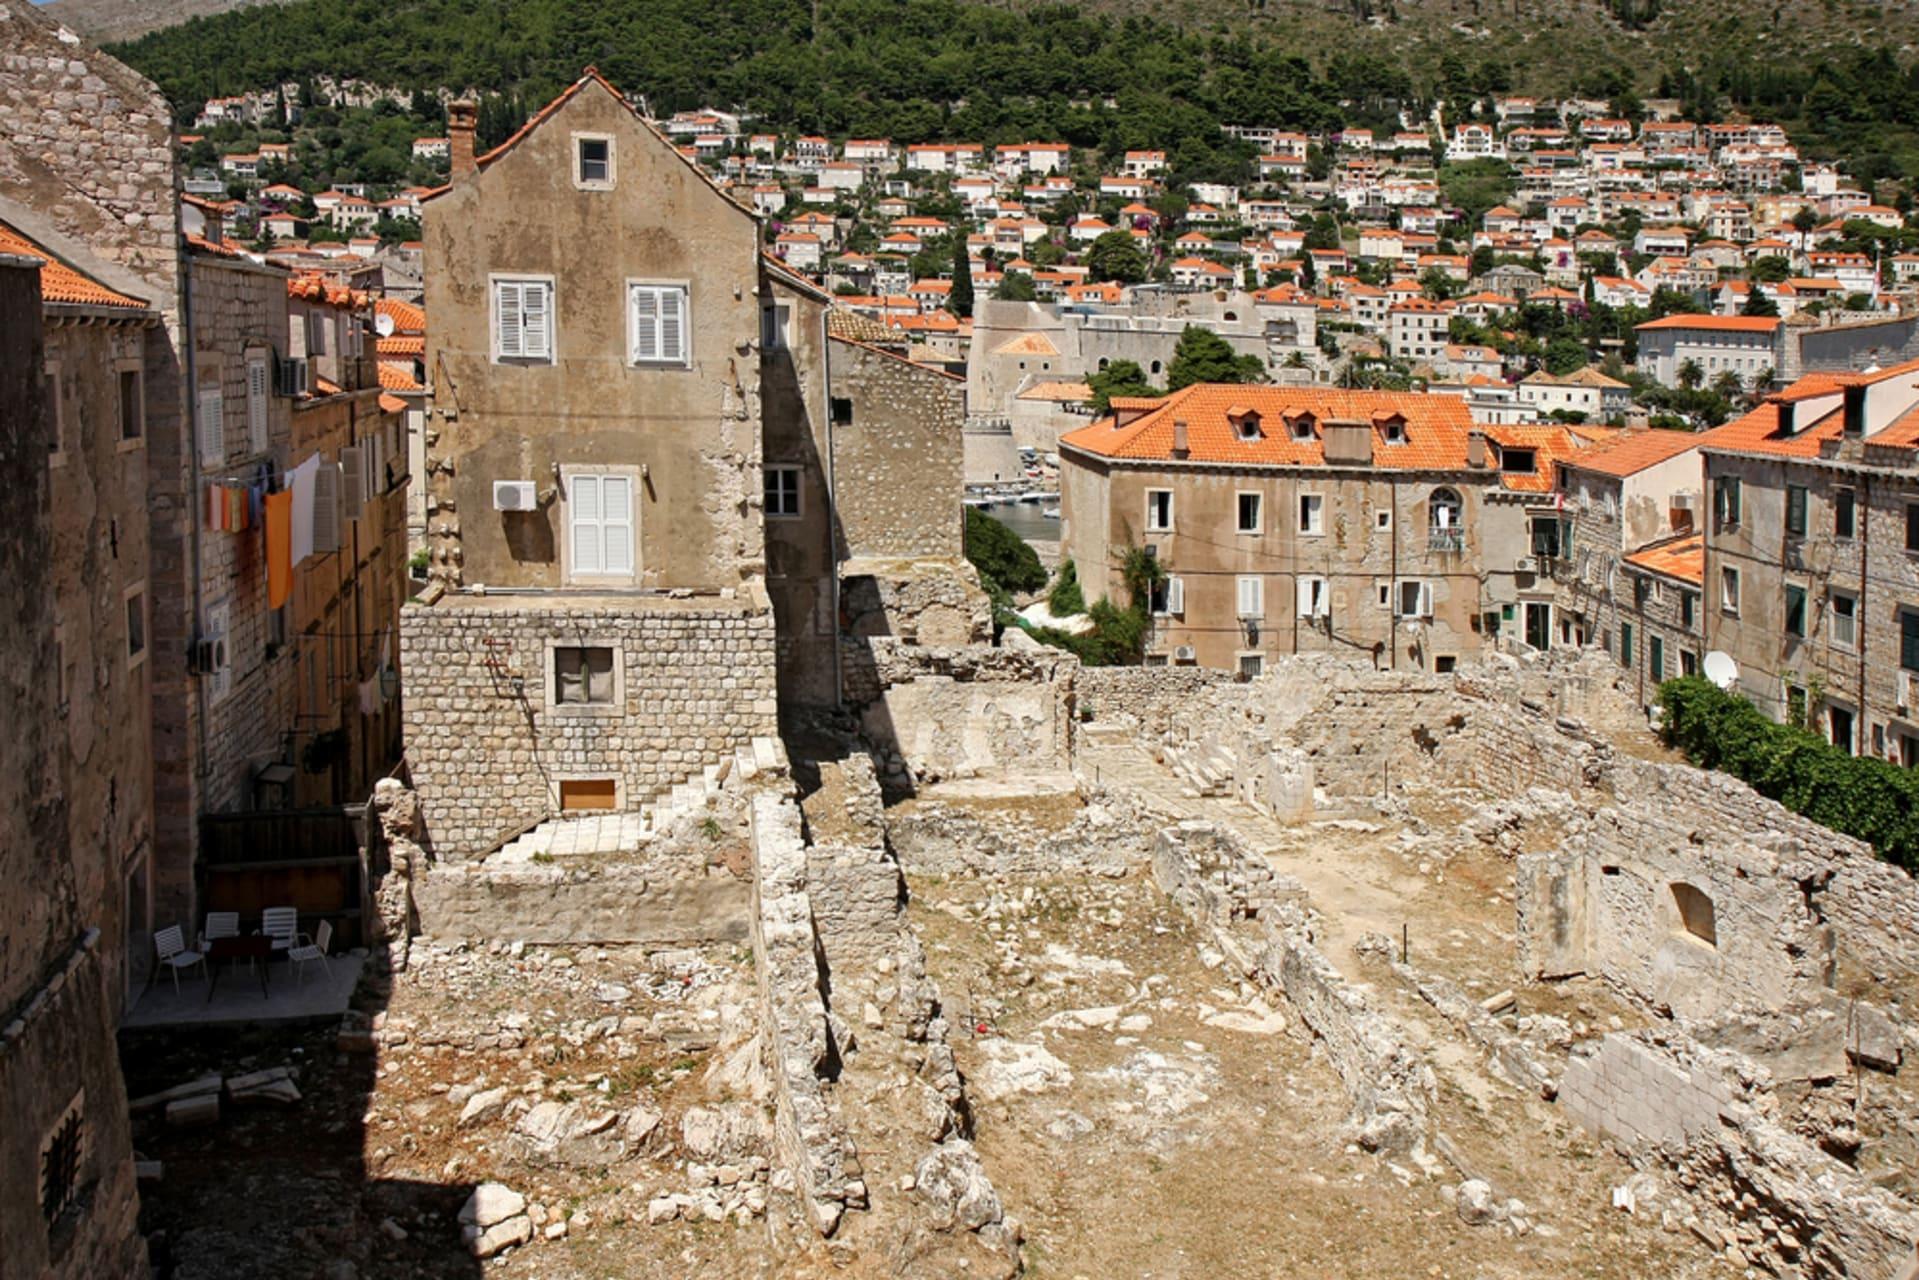 Dubrovnik - War in Dubrovnik 1991